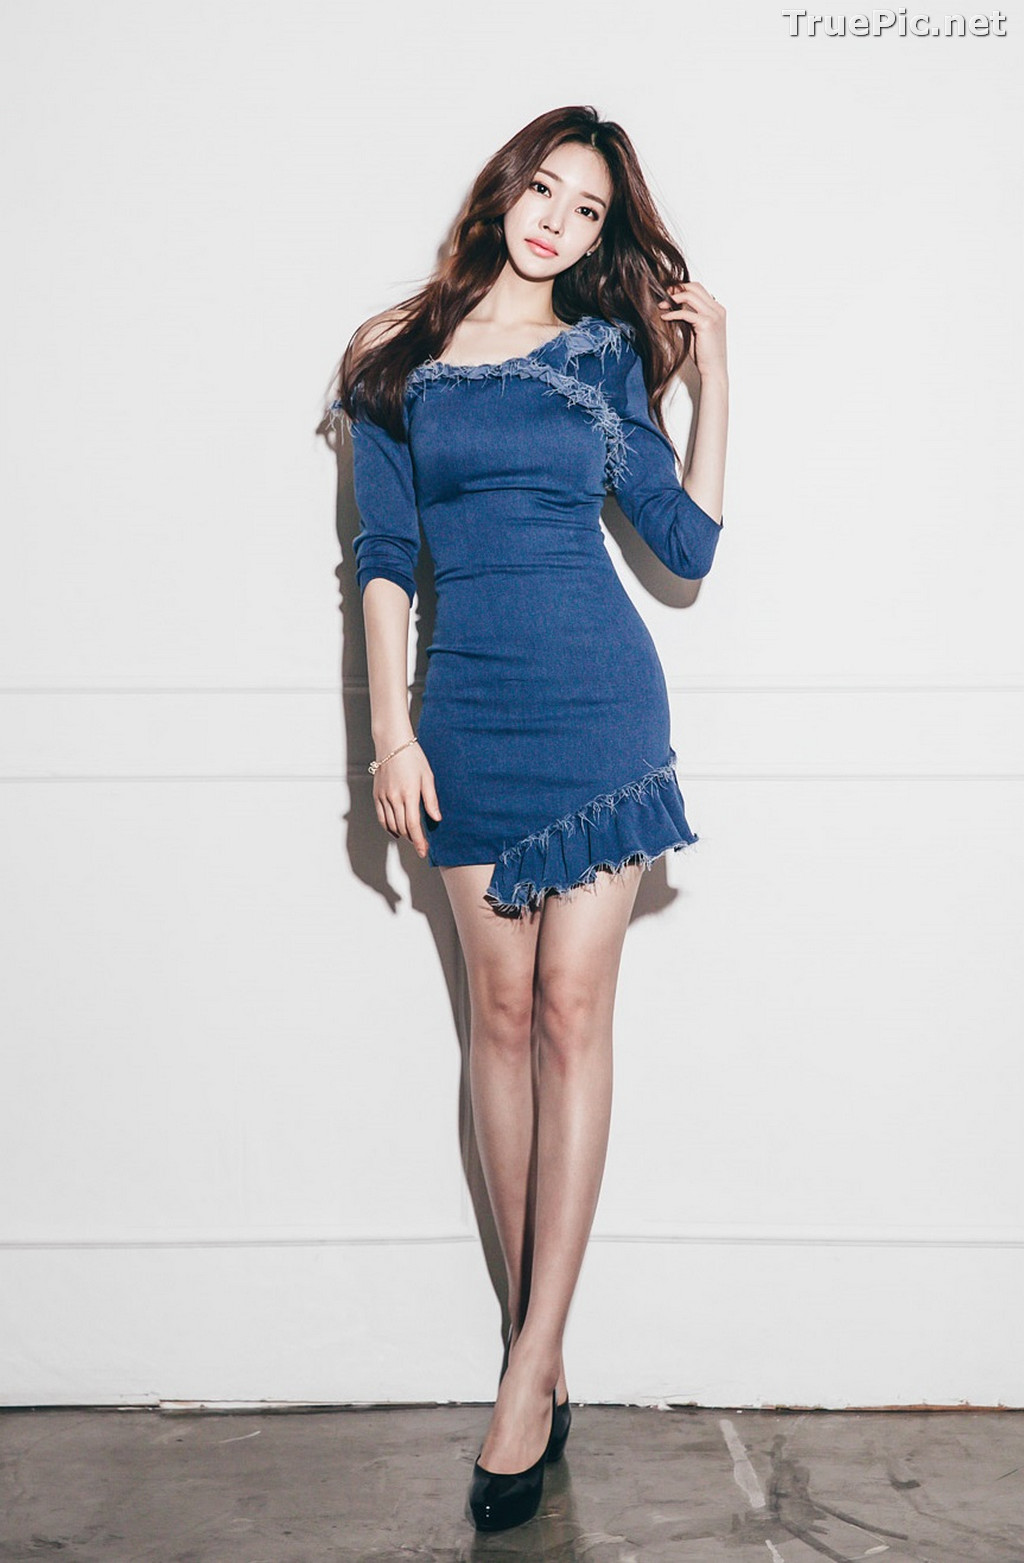 Image Korean Beautiful Model – Park Jung Yoon – Fashion Photography #10 - TruePic.net - Picture-9